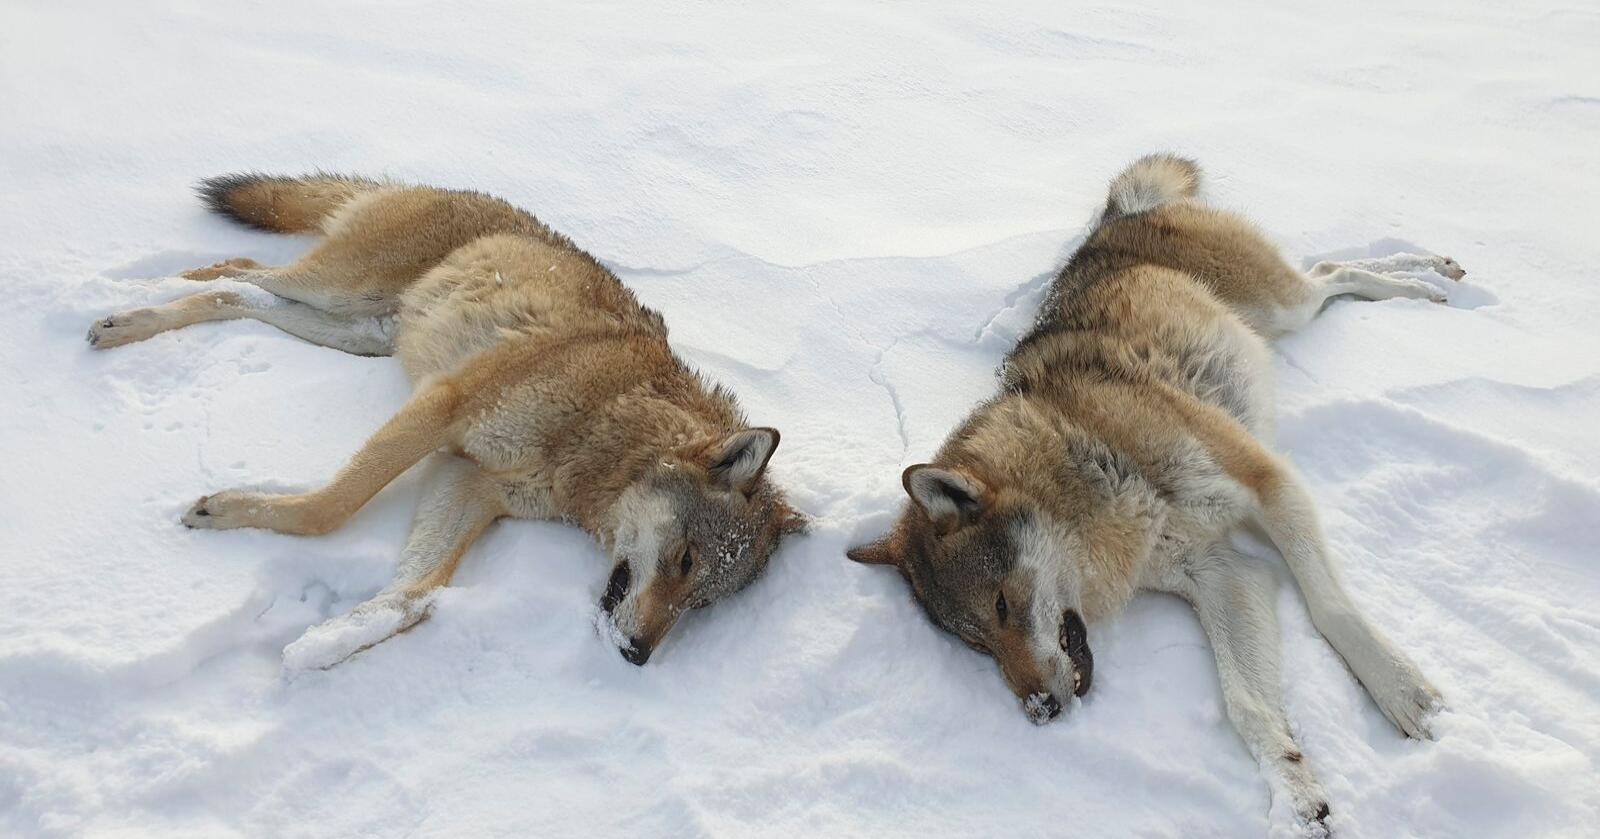 Arbeiderpartiet har nå en historisk mulighet i ulvesaken, ifølge Senterpartiet og Fremskrittspartiet. Foto: Statens Naturoppsyn / NTB scanpix.